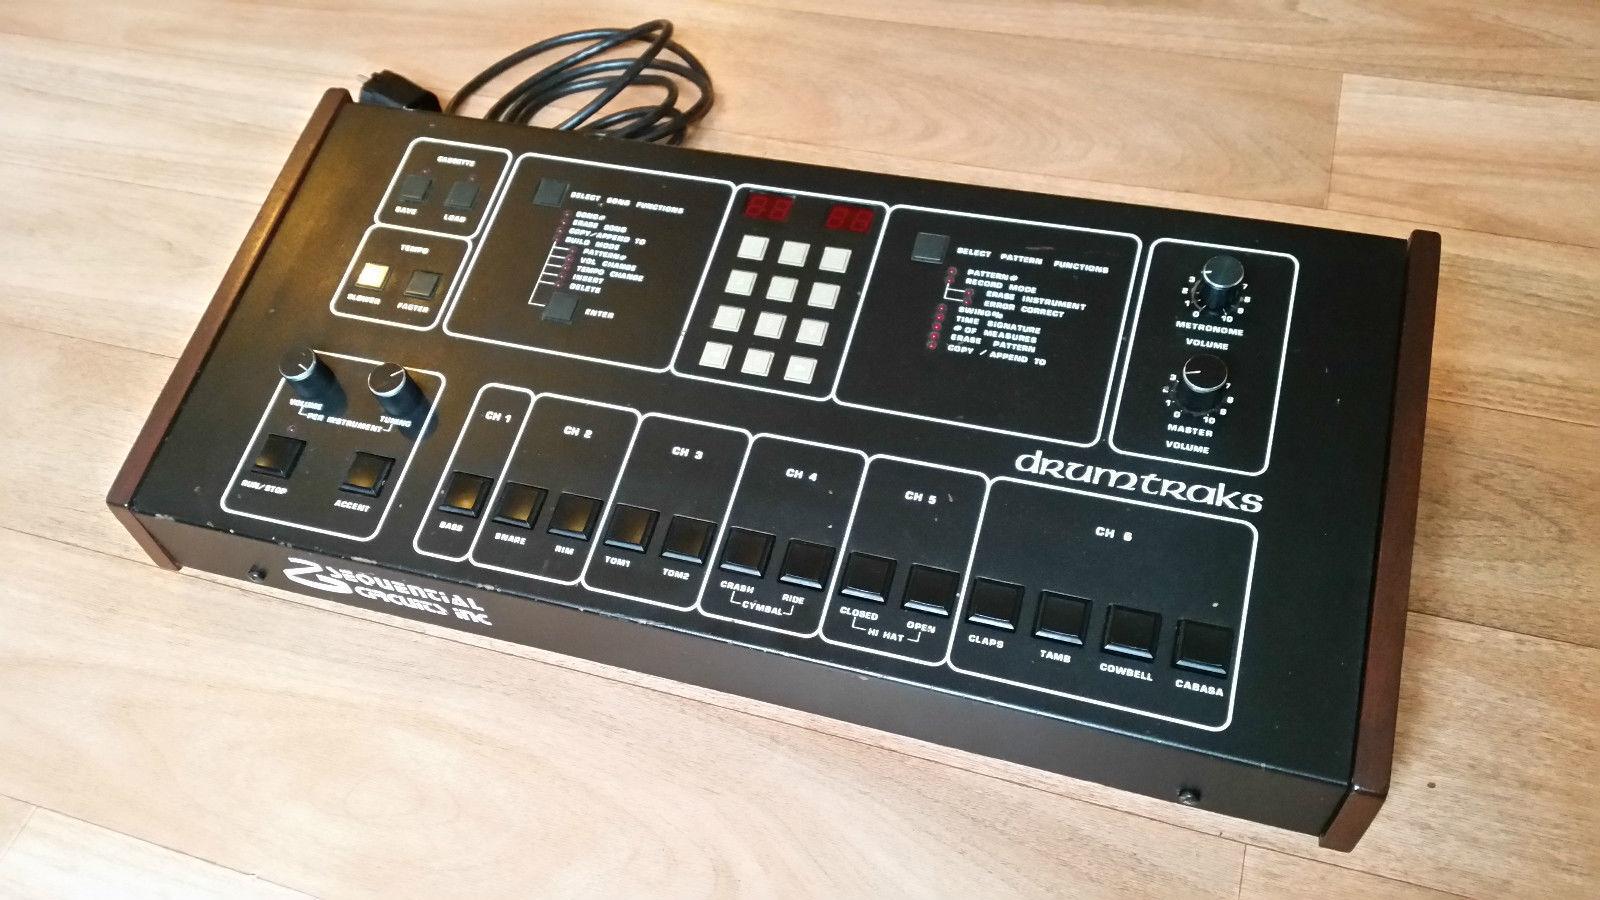 Sequential Circuits drumtraks-Roger Linn lm1 lm2